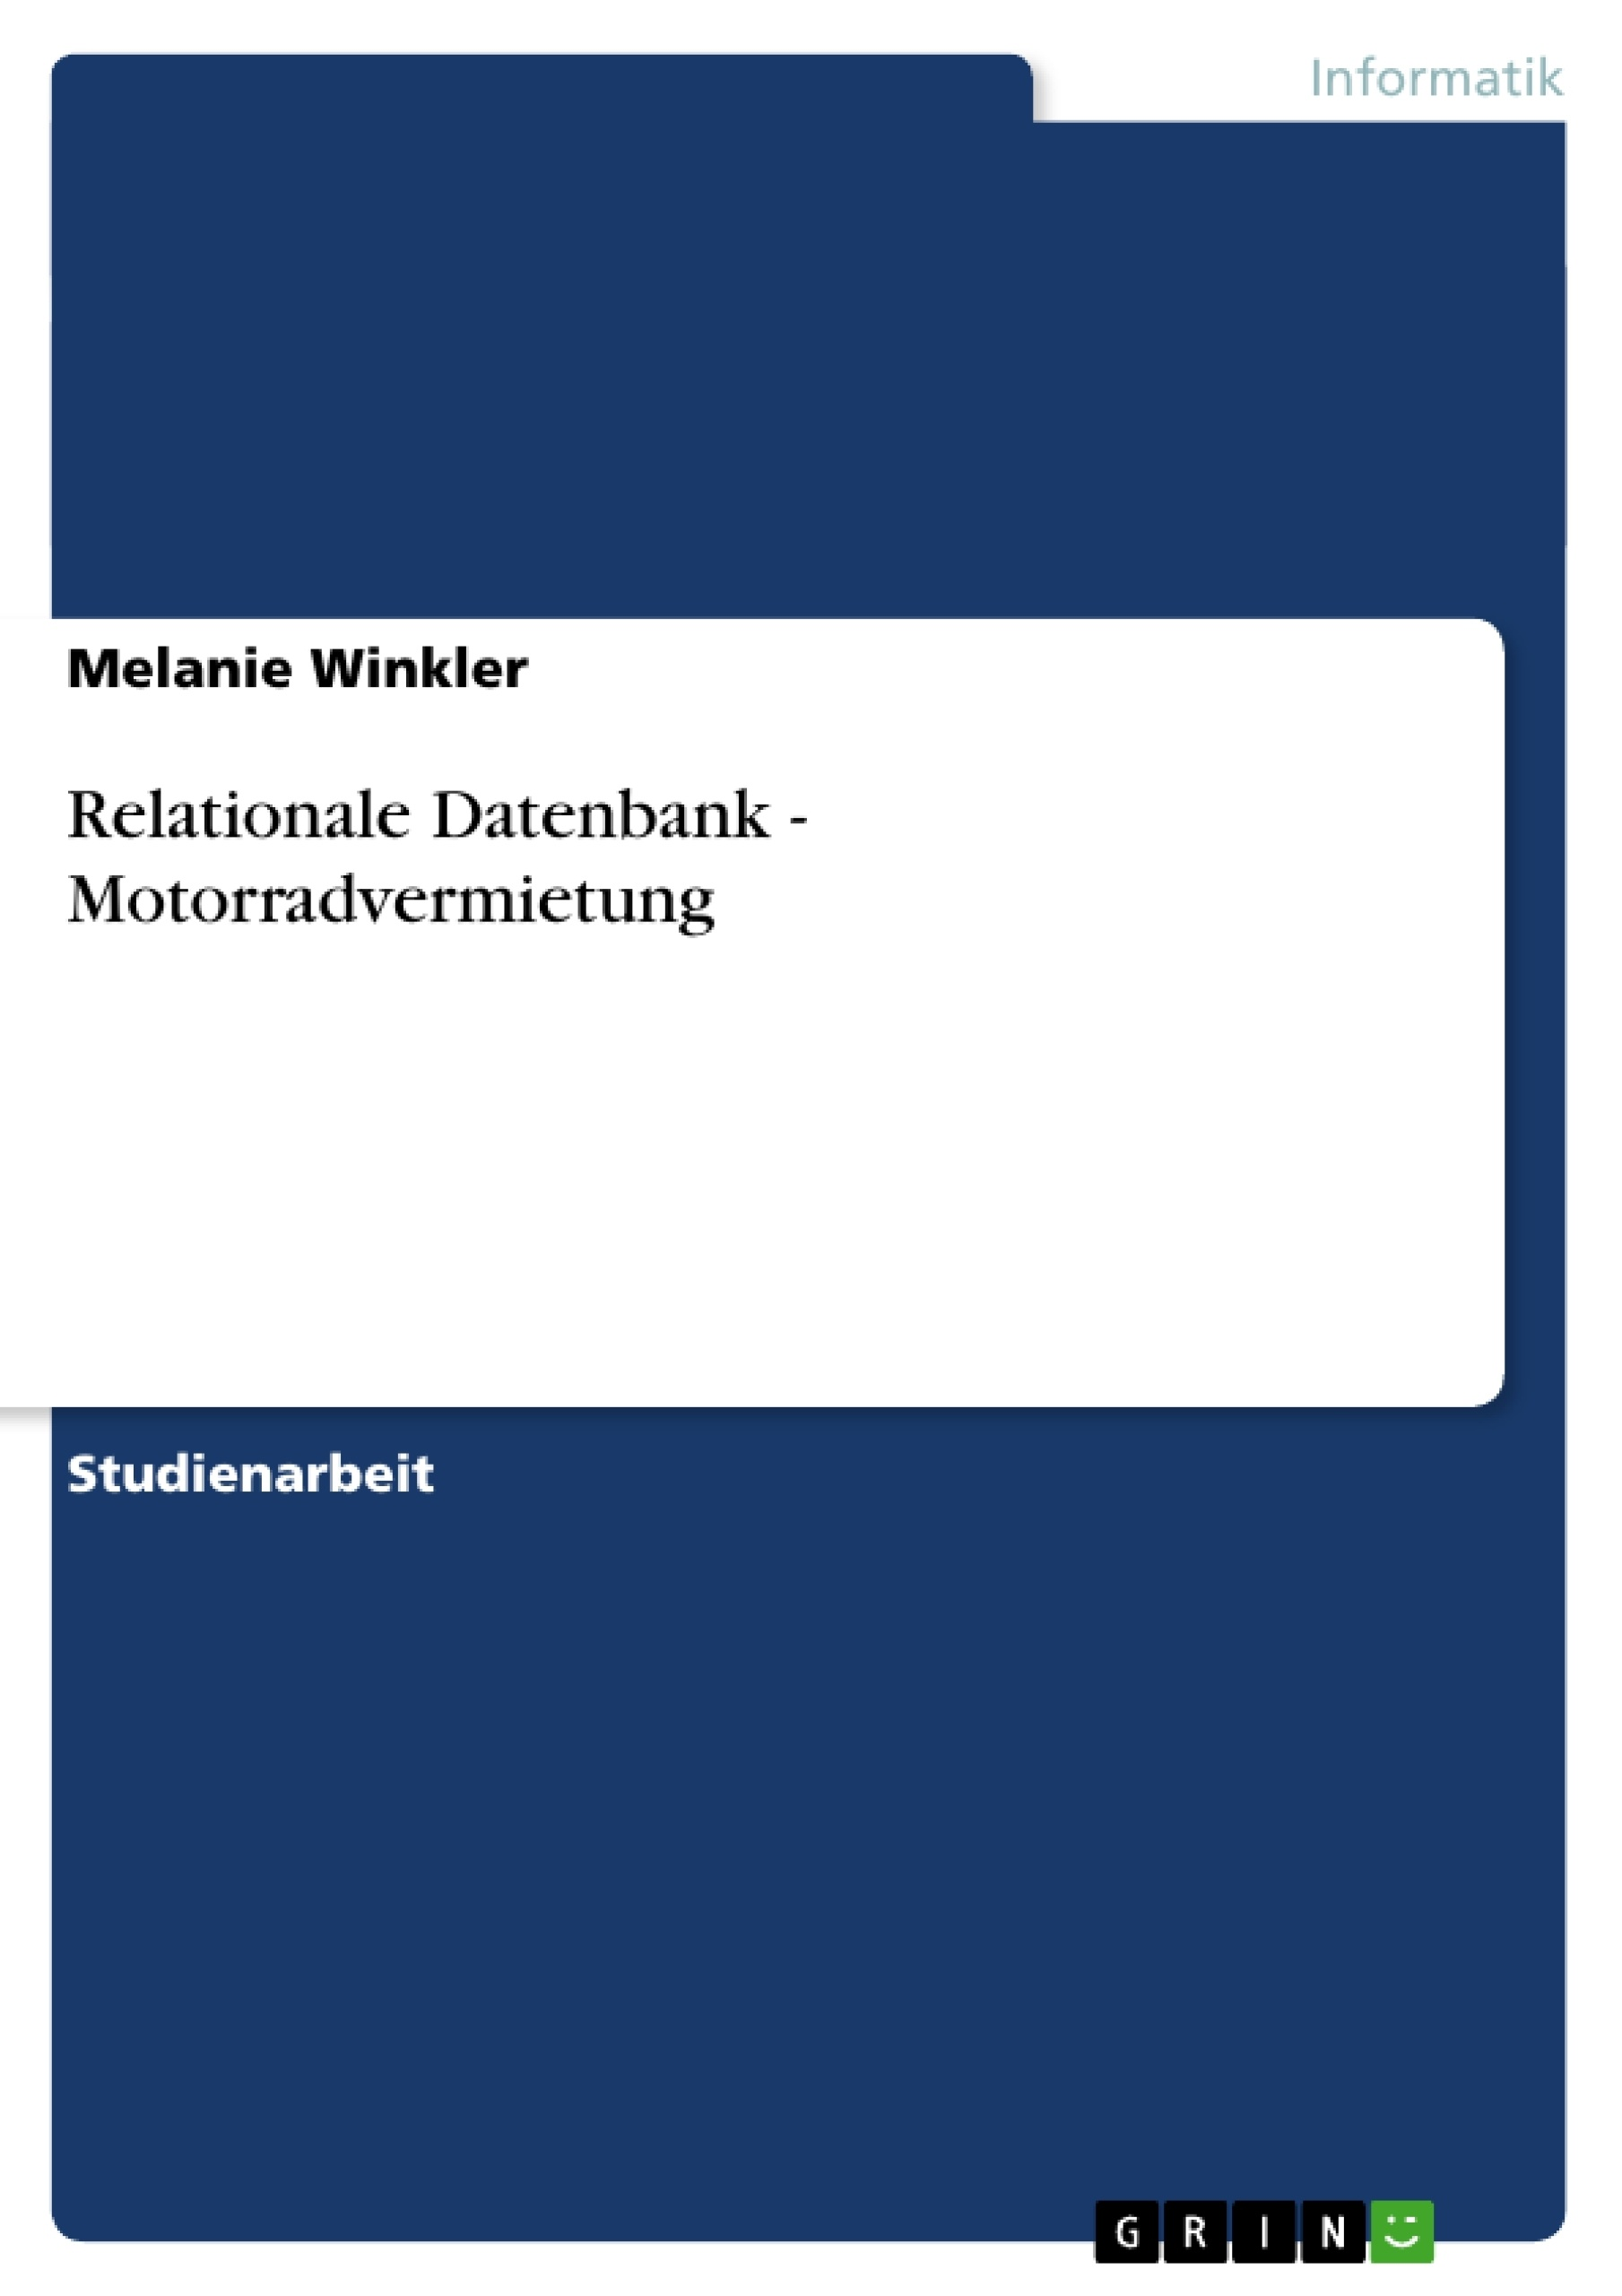 Titel: Relationale Datenbank - Motorradvermietung